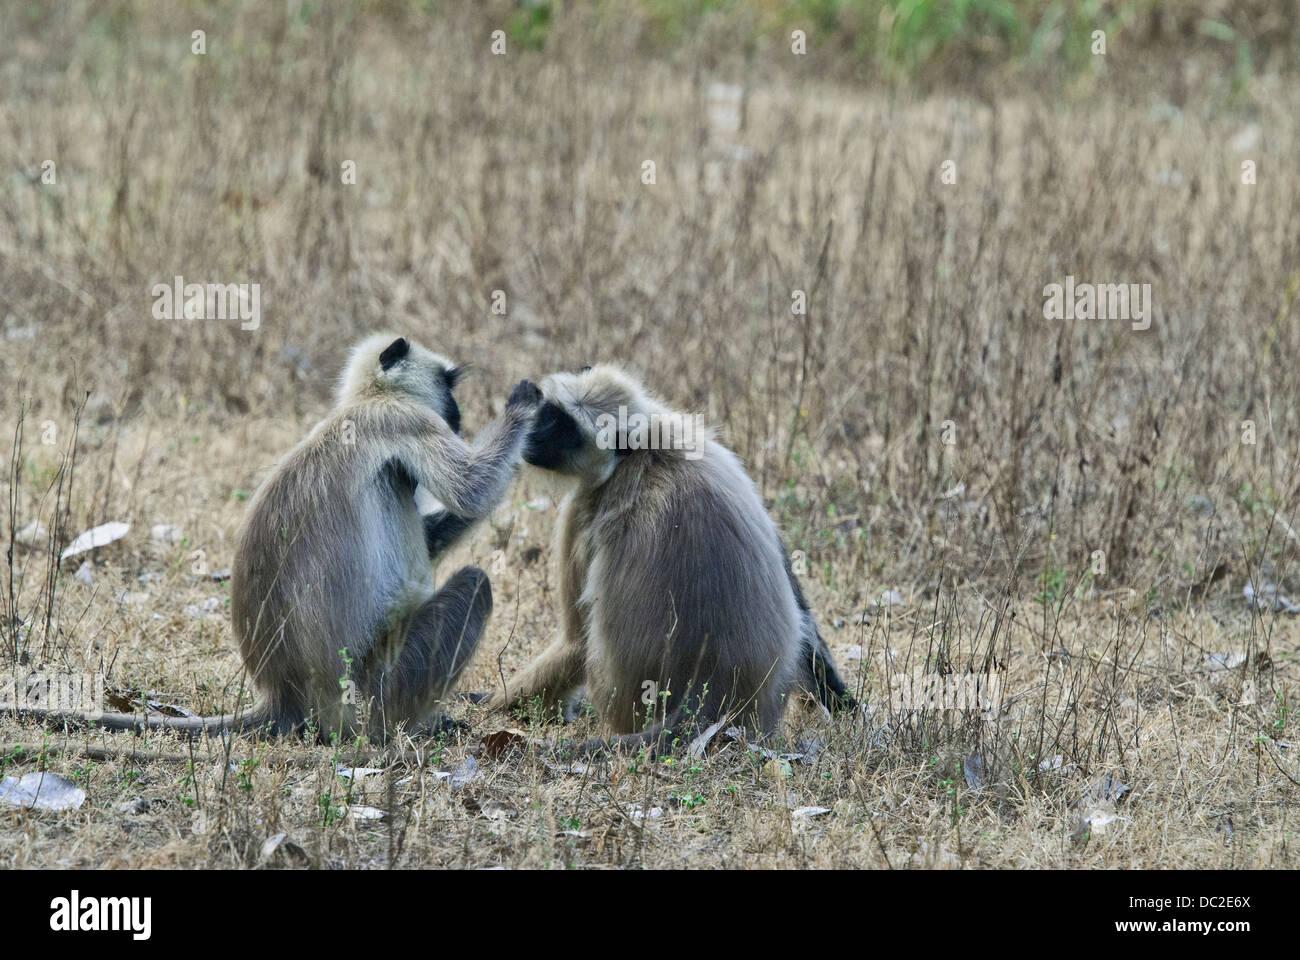 Black-faced Langur monkeys engaged in social grooming in Bandhavgarh National Park, India - Stock Image